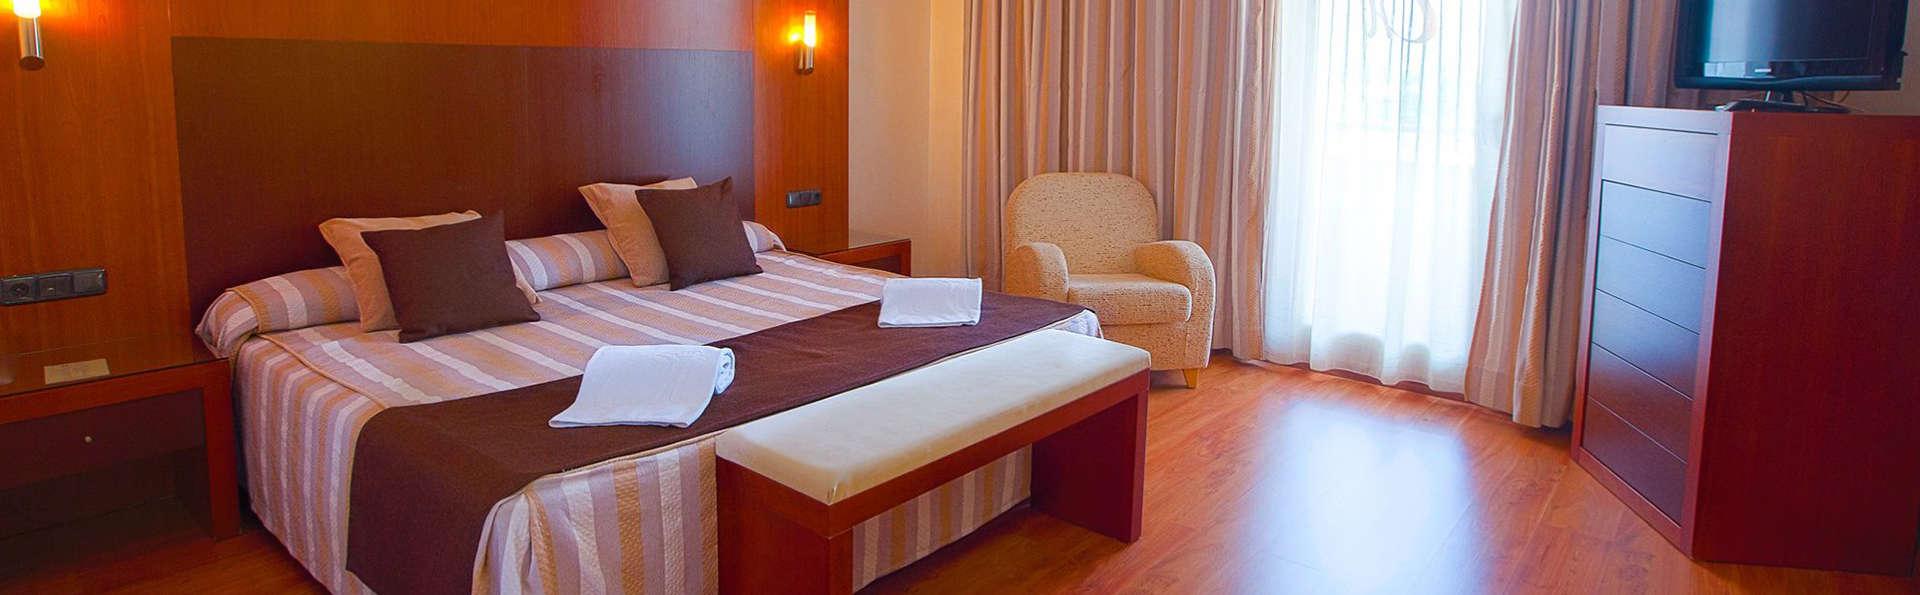 Hotel Montera Plaza - EDIT_room1.jpg